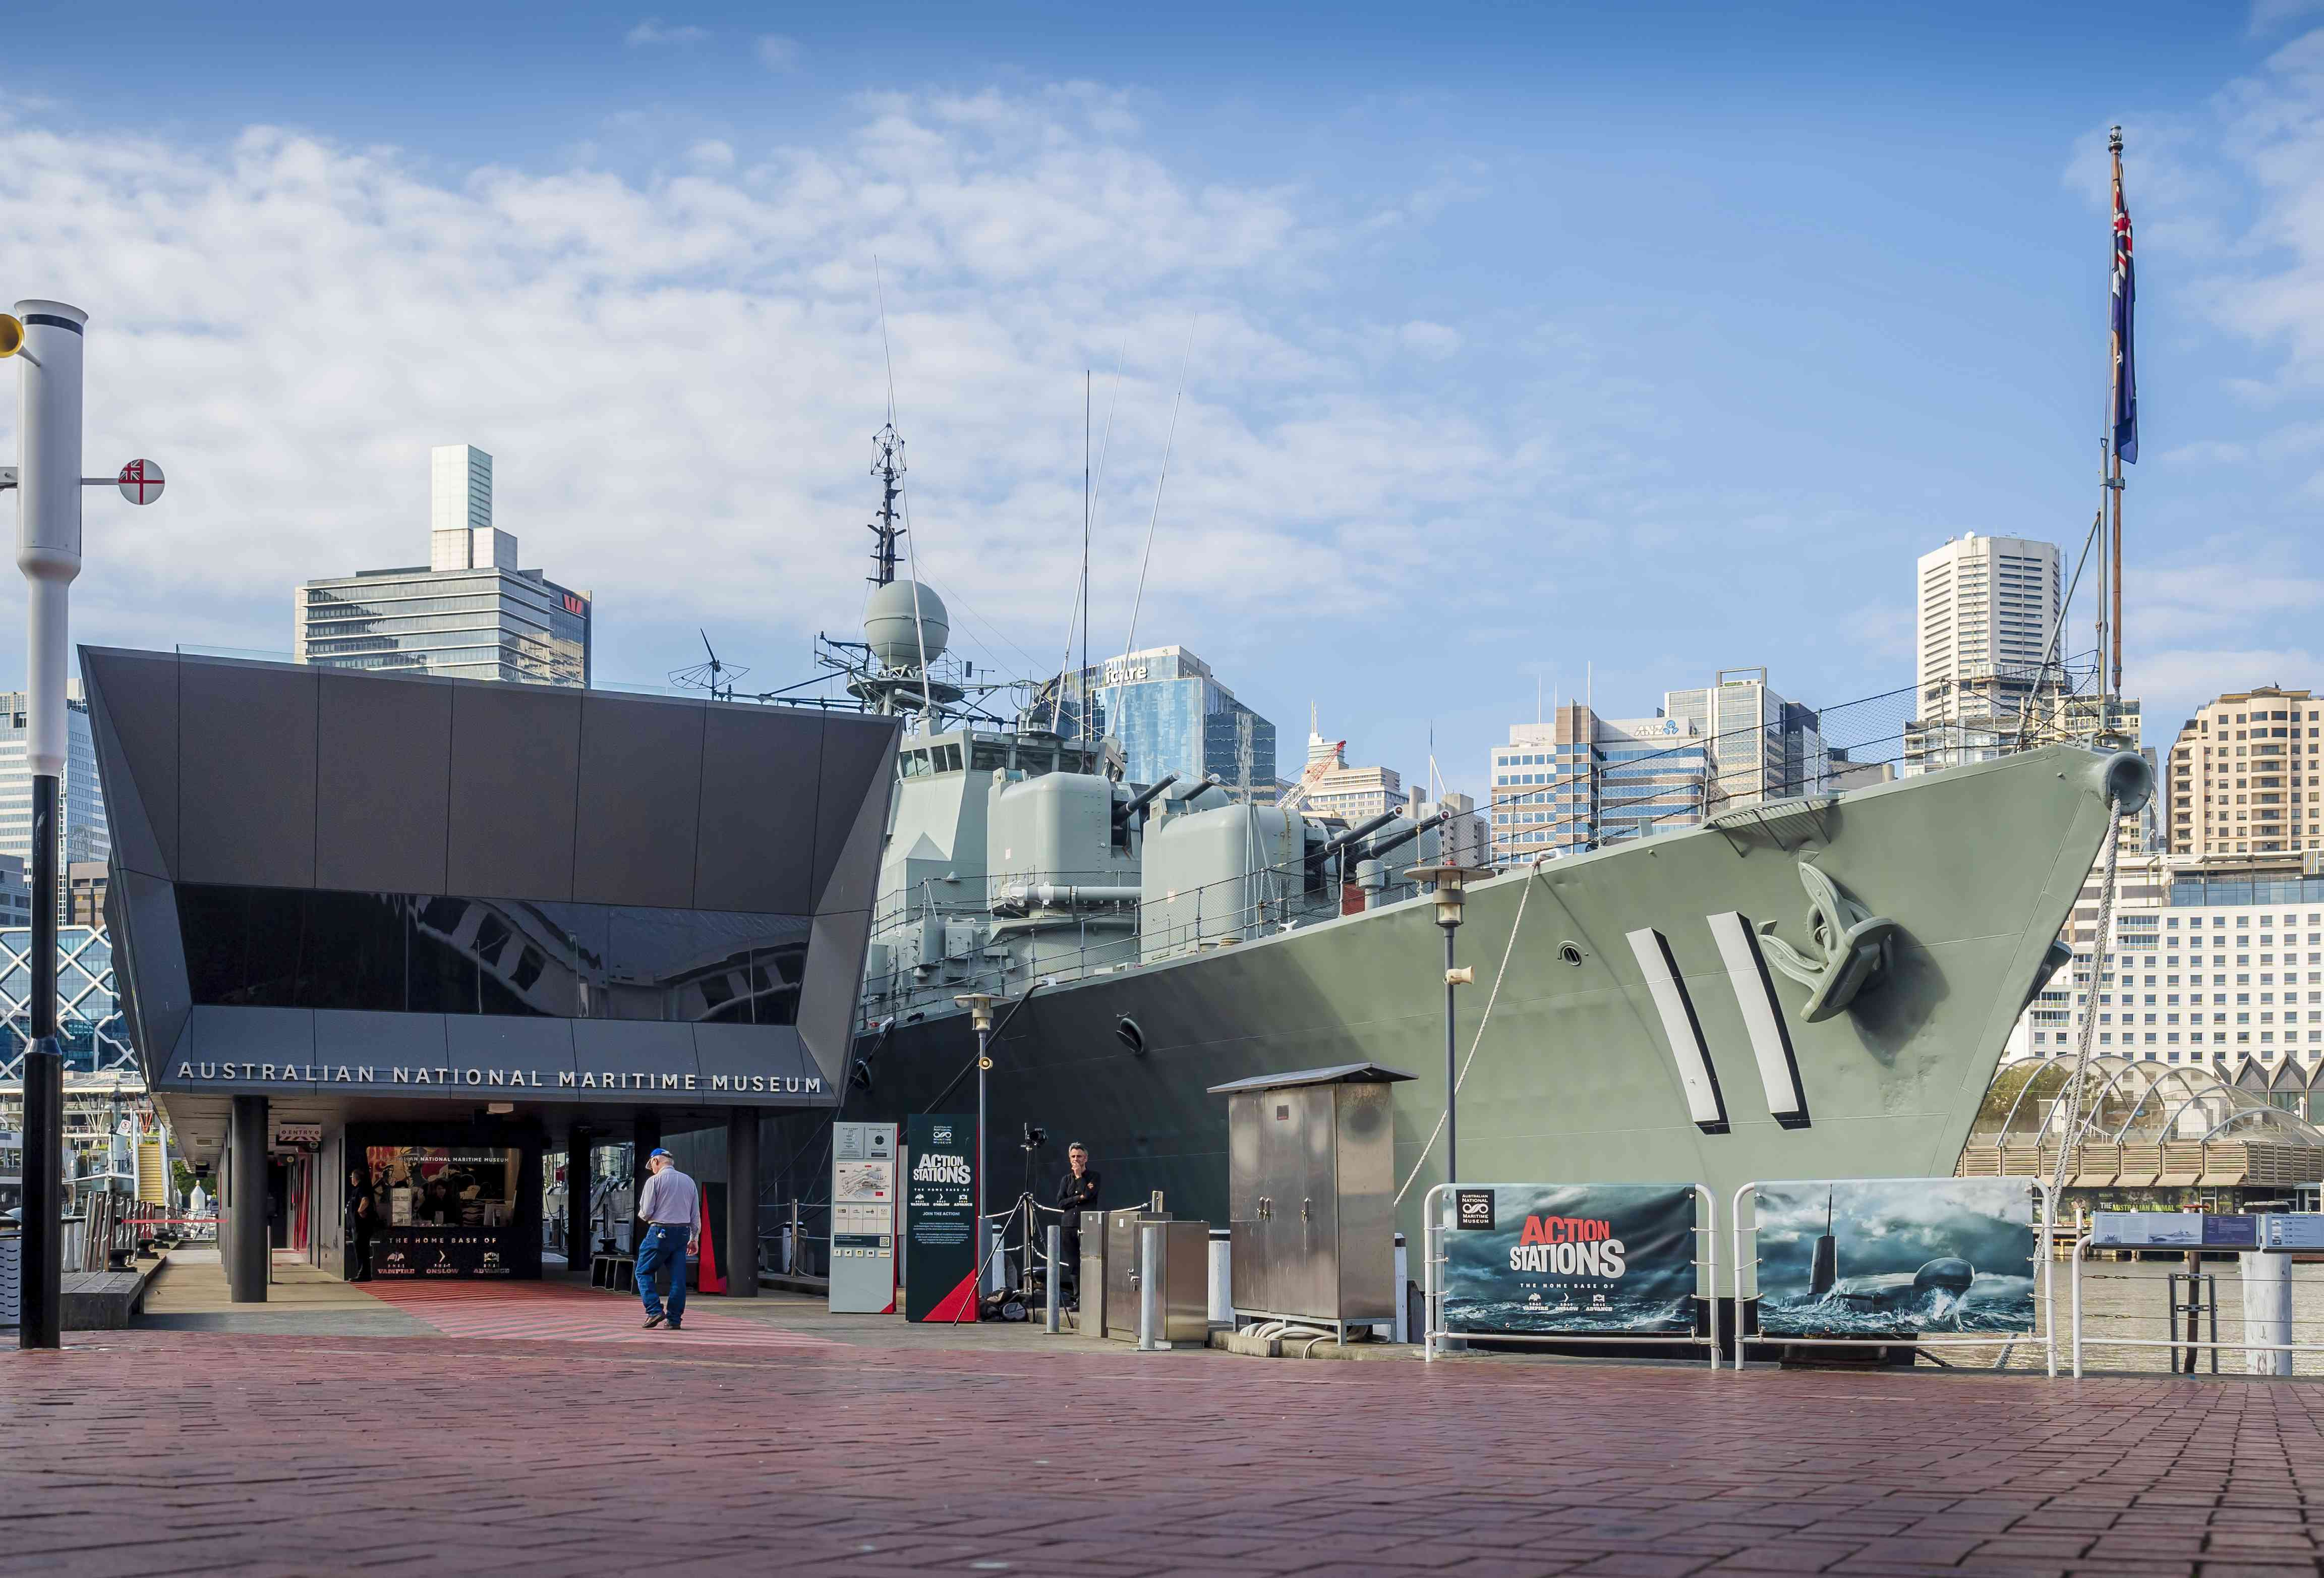 At the Australian National Maritime Museum